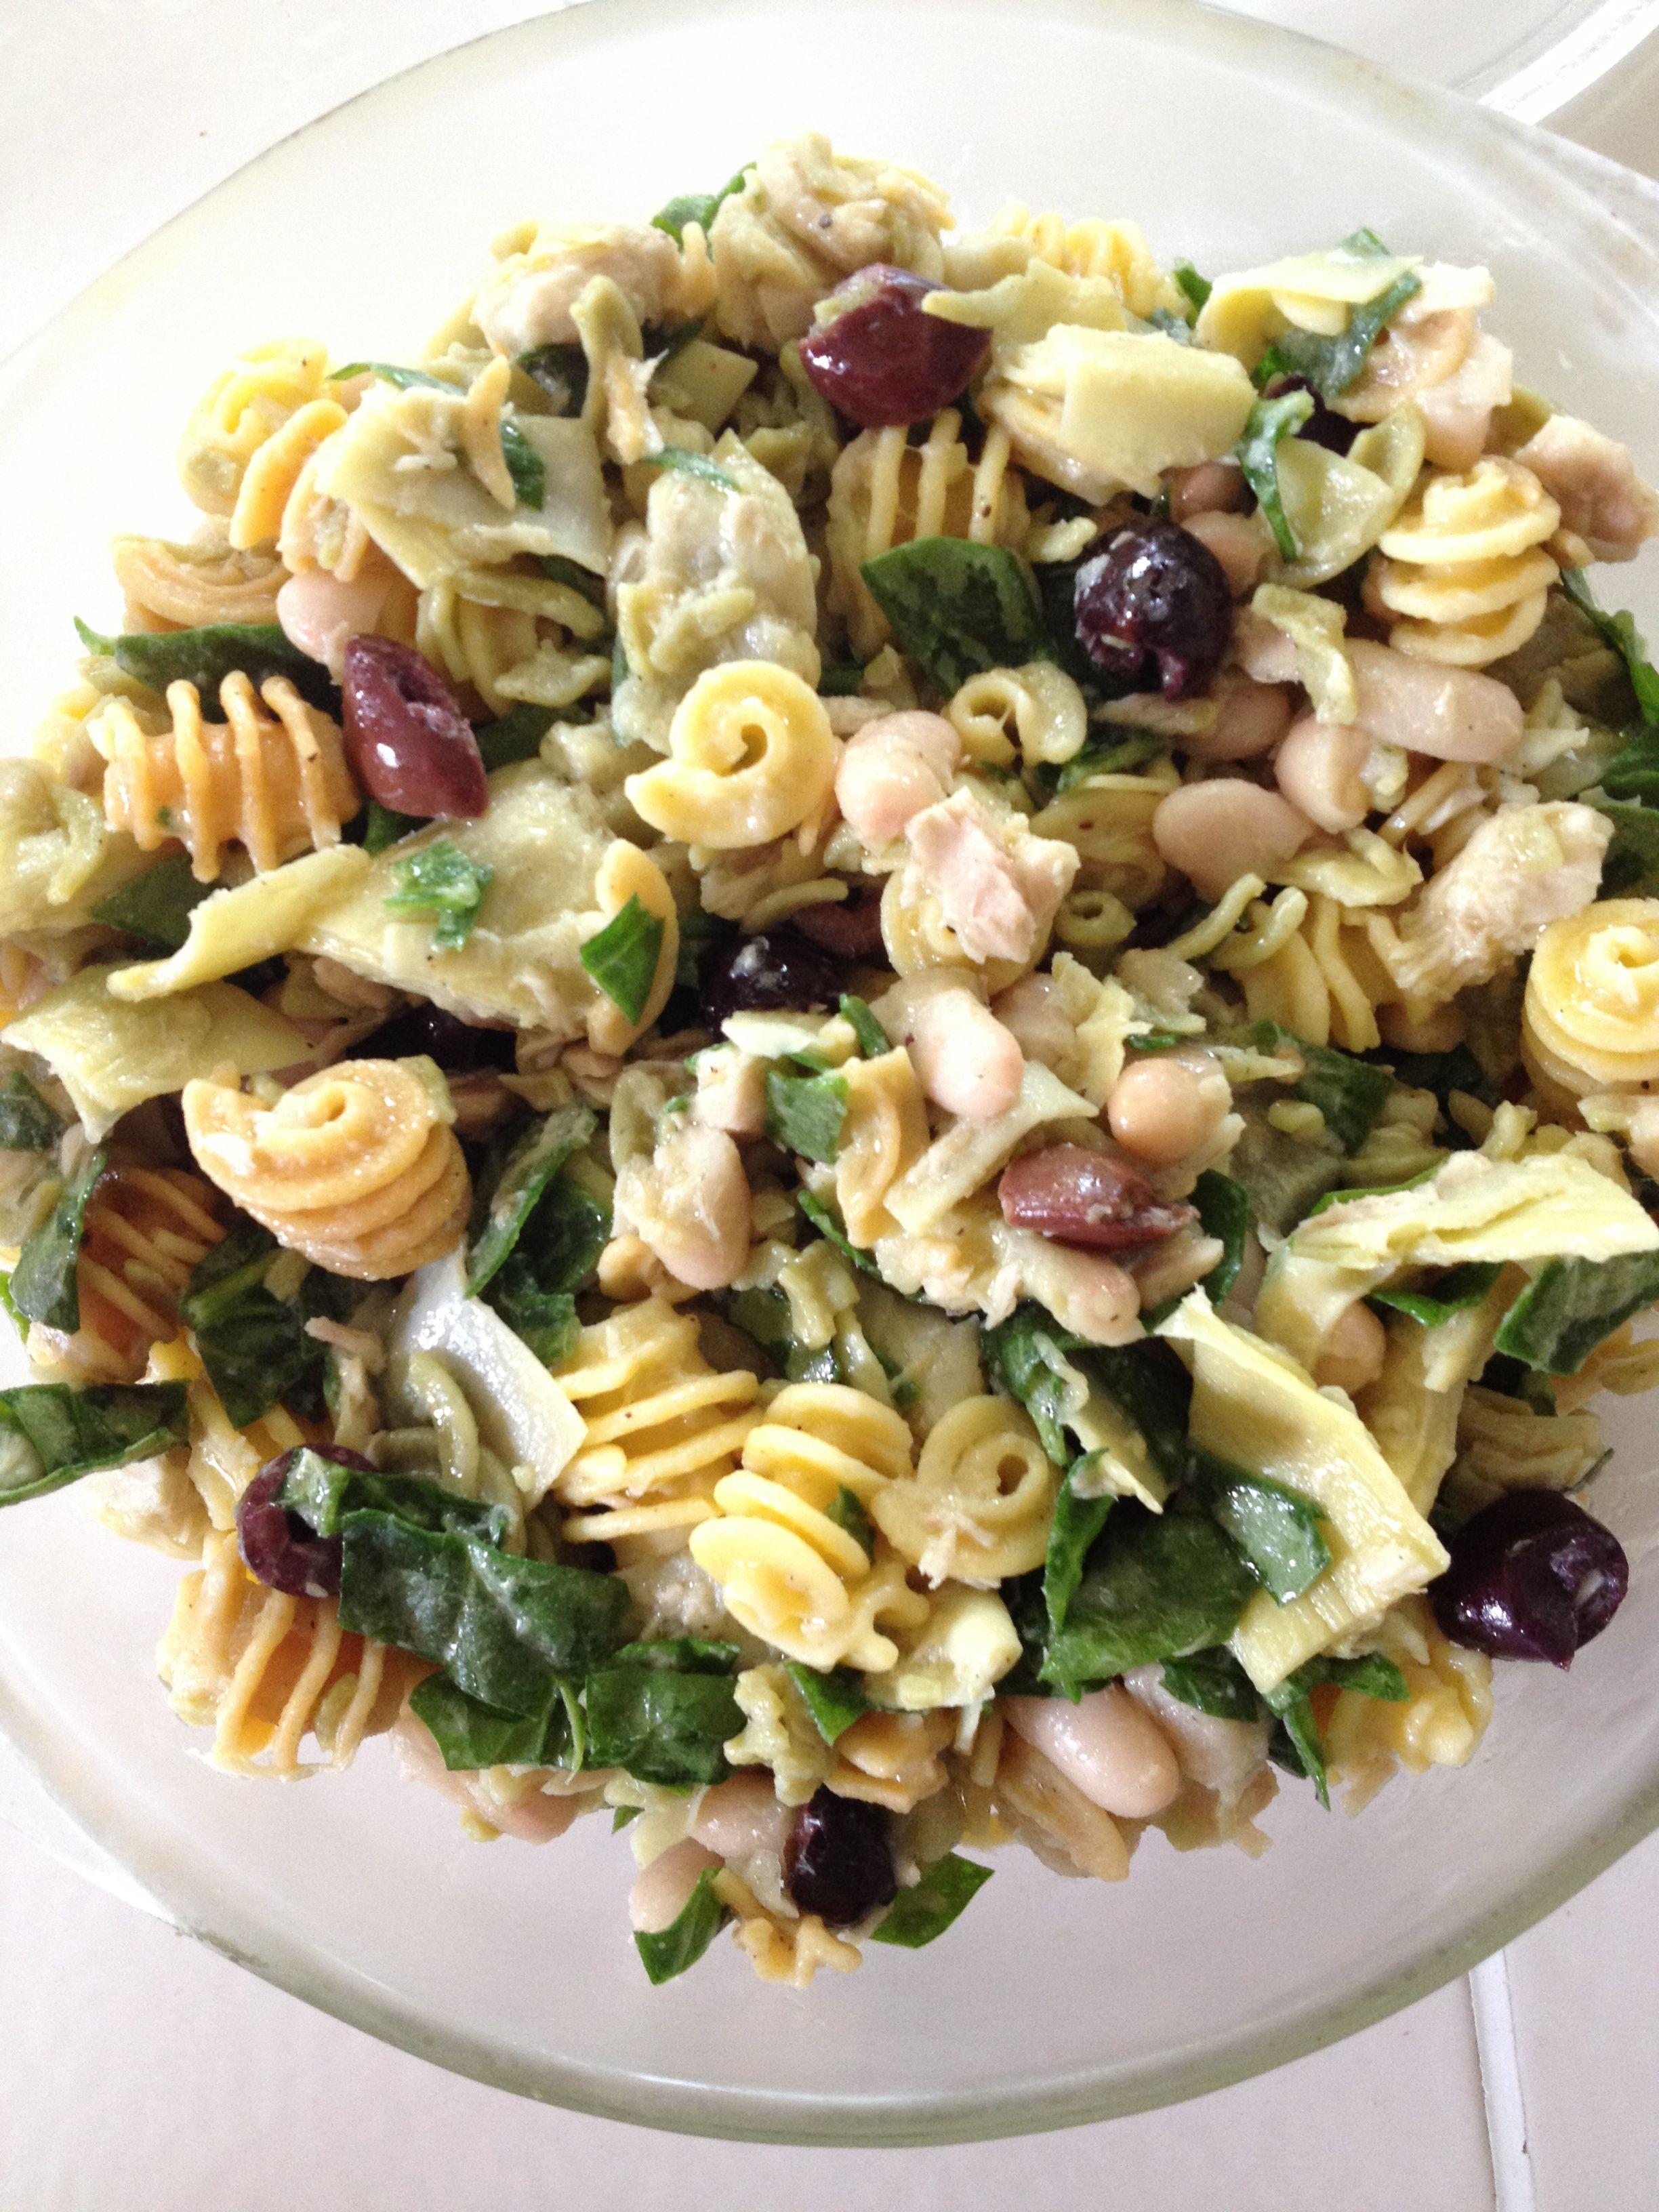 Greek gluten free pasta salad combine ancient harvest